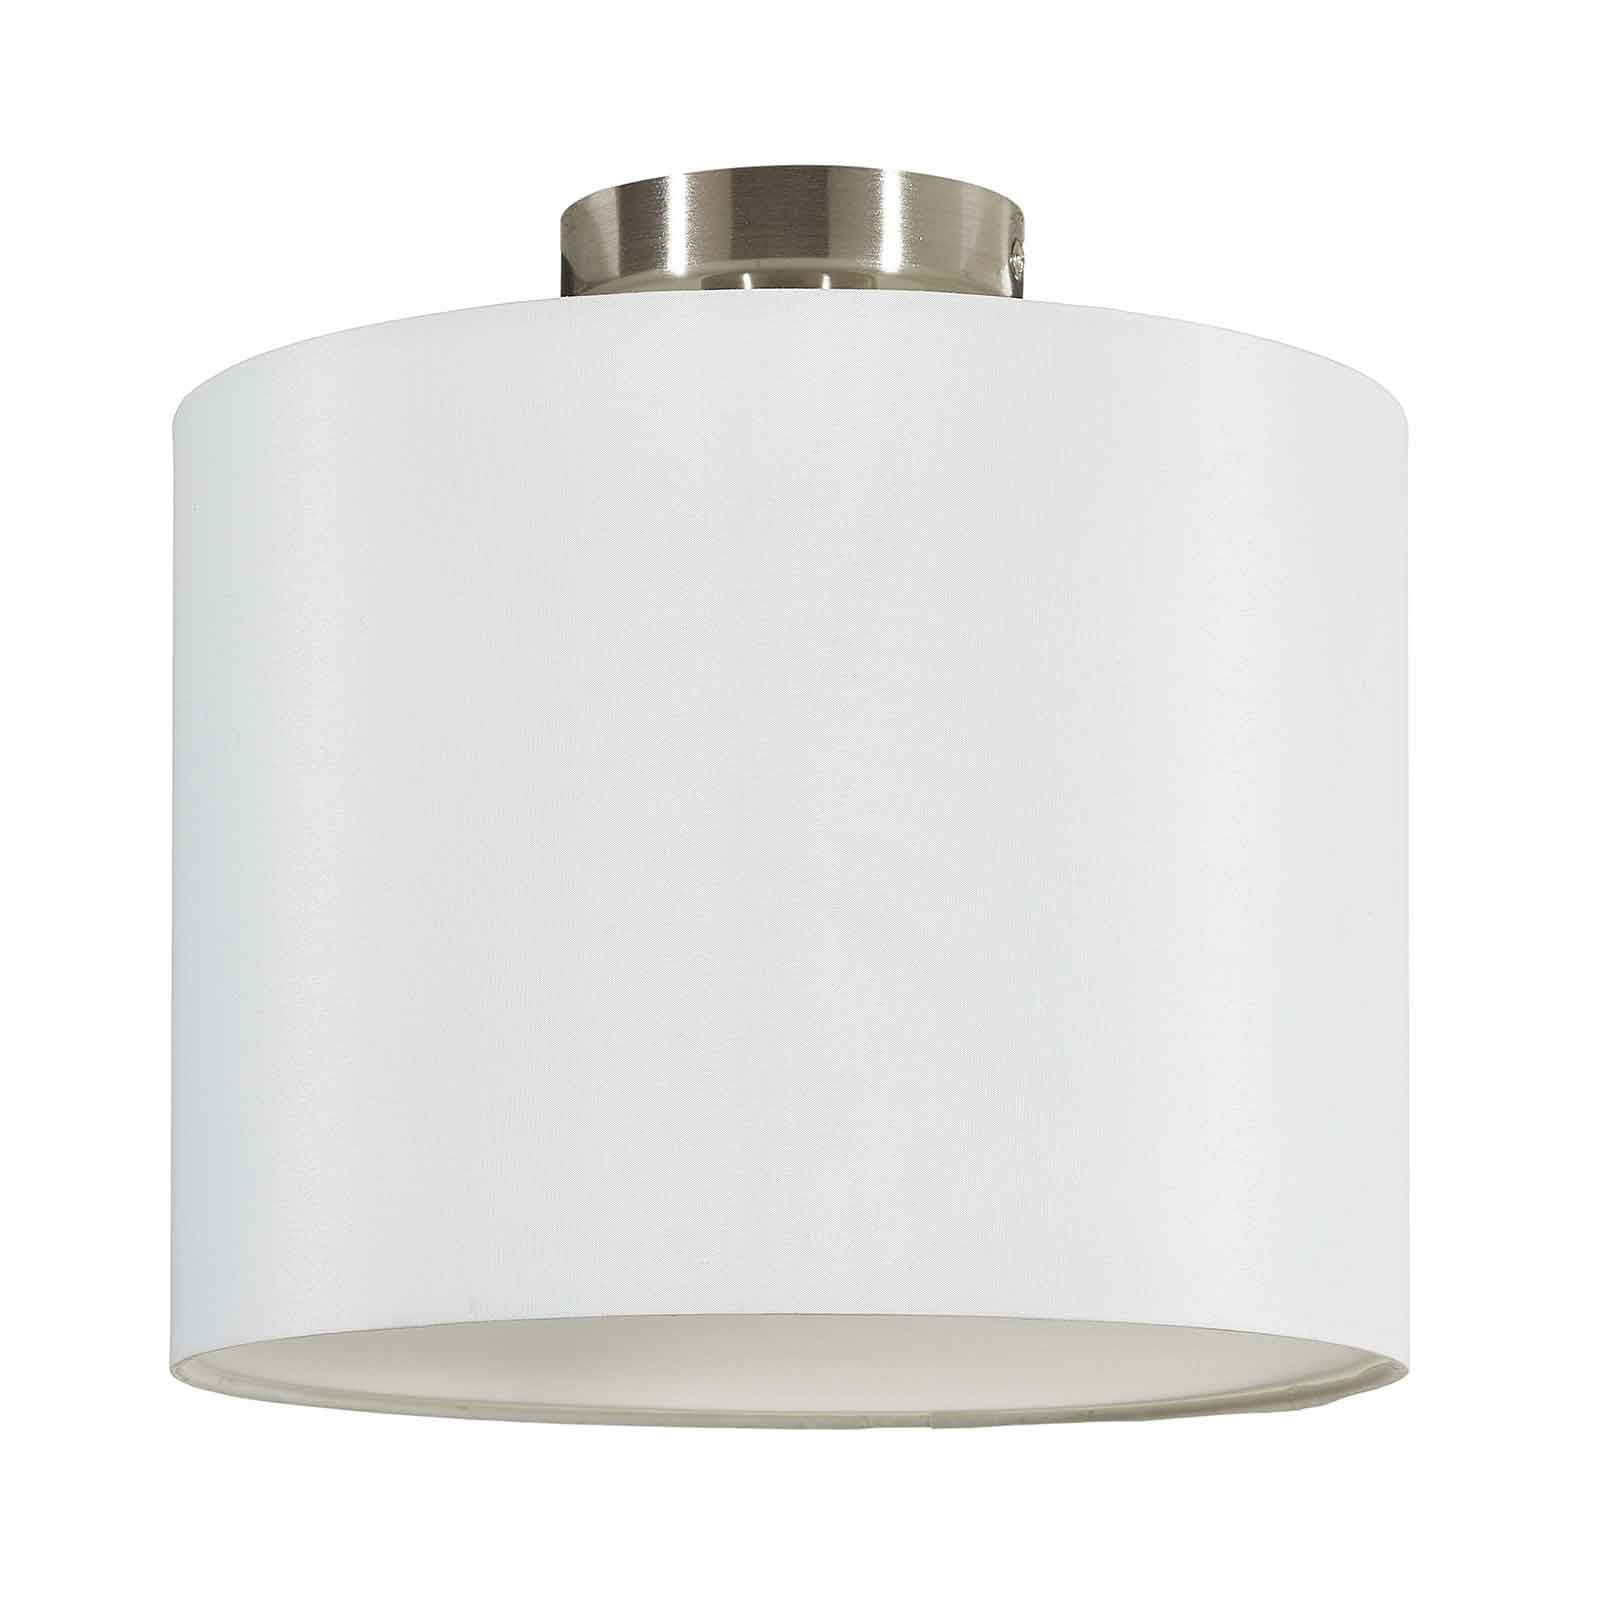 Lucande Patrik lampa sufitowa Ø30cm biała